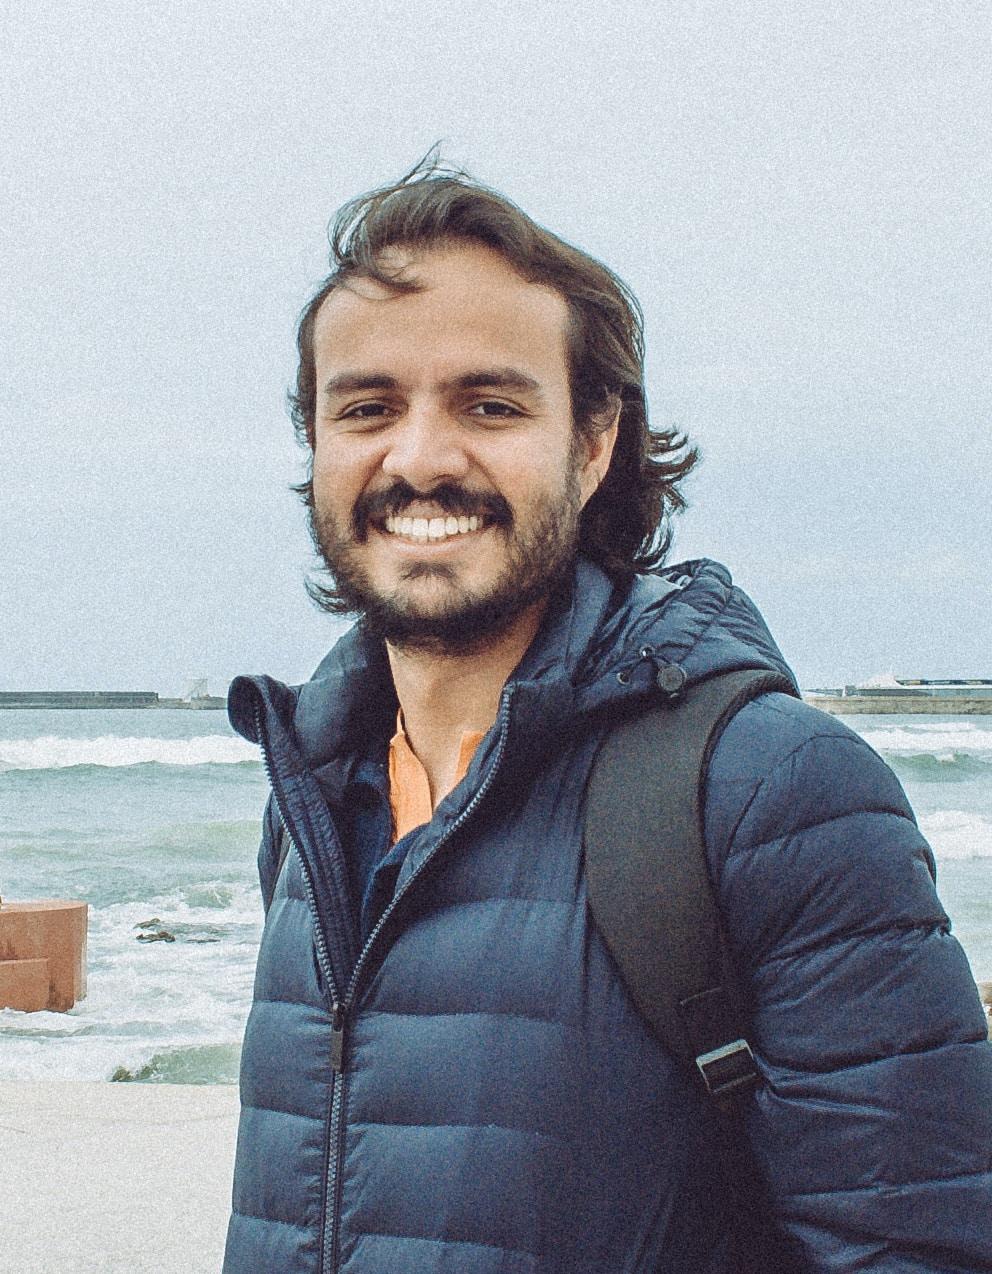 Go to Paulo Sérgio Meireles's profile